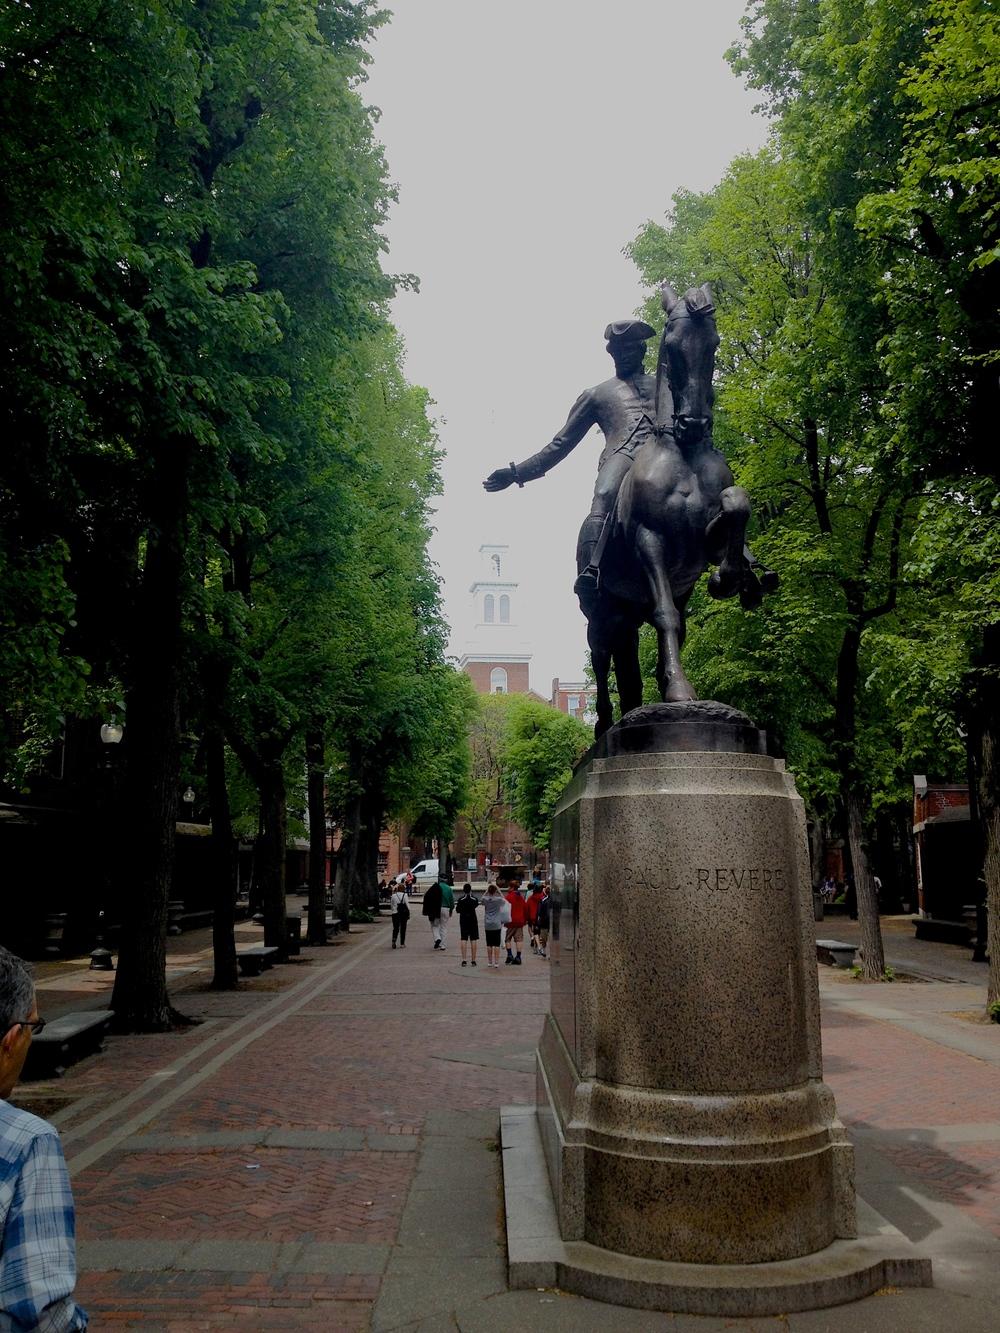 Paul Revere: Badass Patriot and stellar horse rider